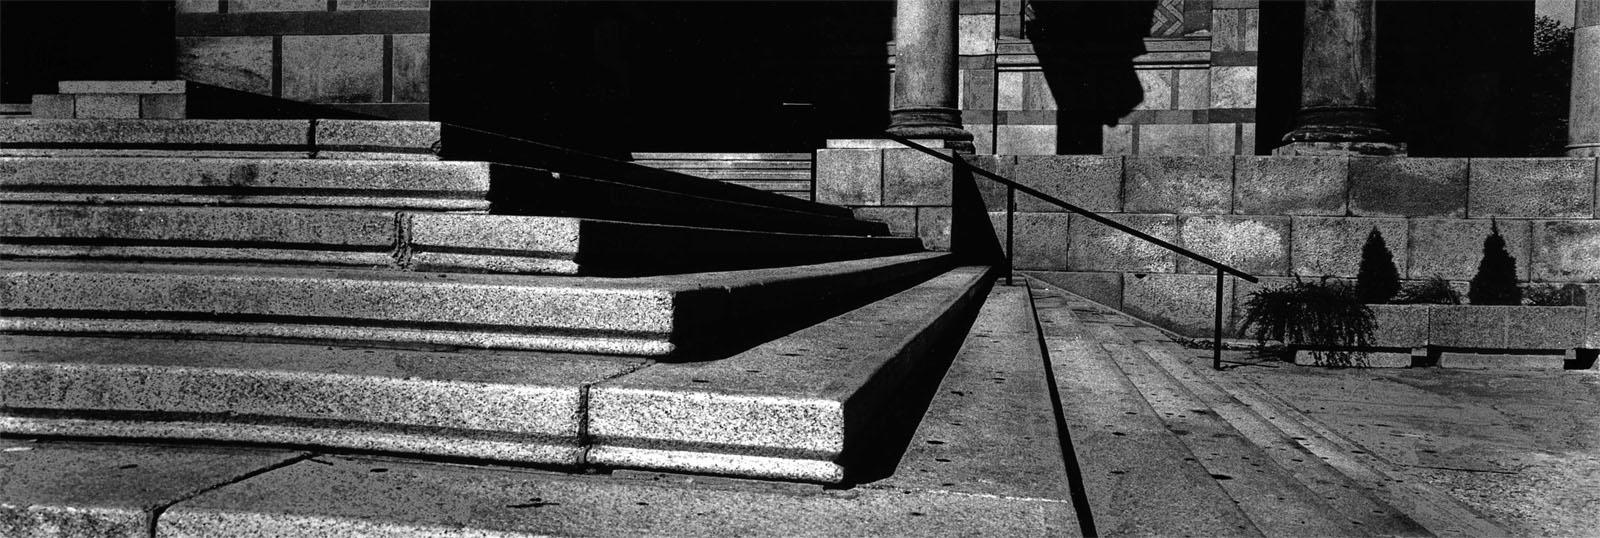 Art and Documentary Photography - Loading BGD___Fabio_Sgroi_039.jpg